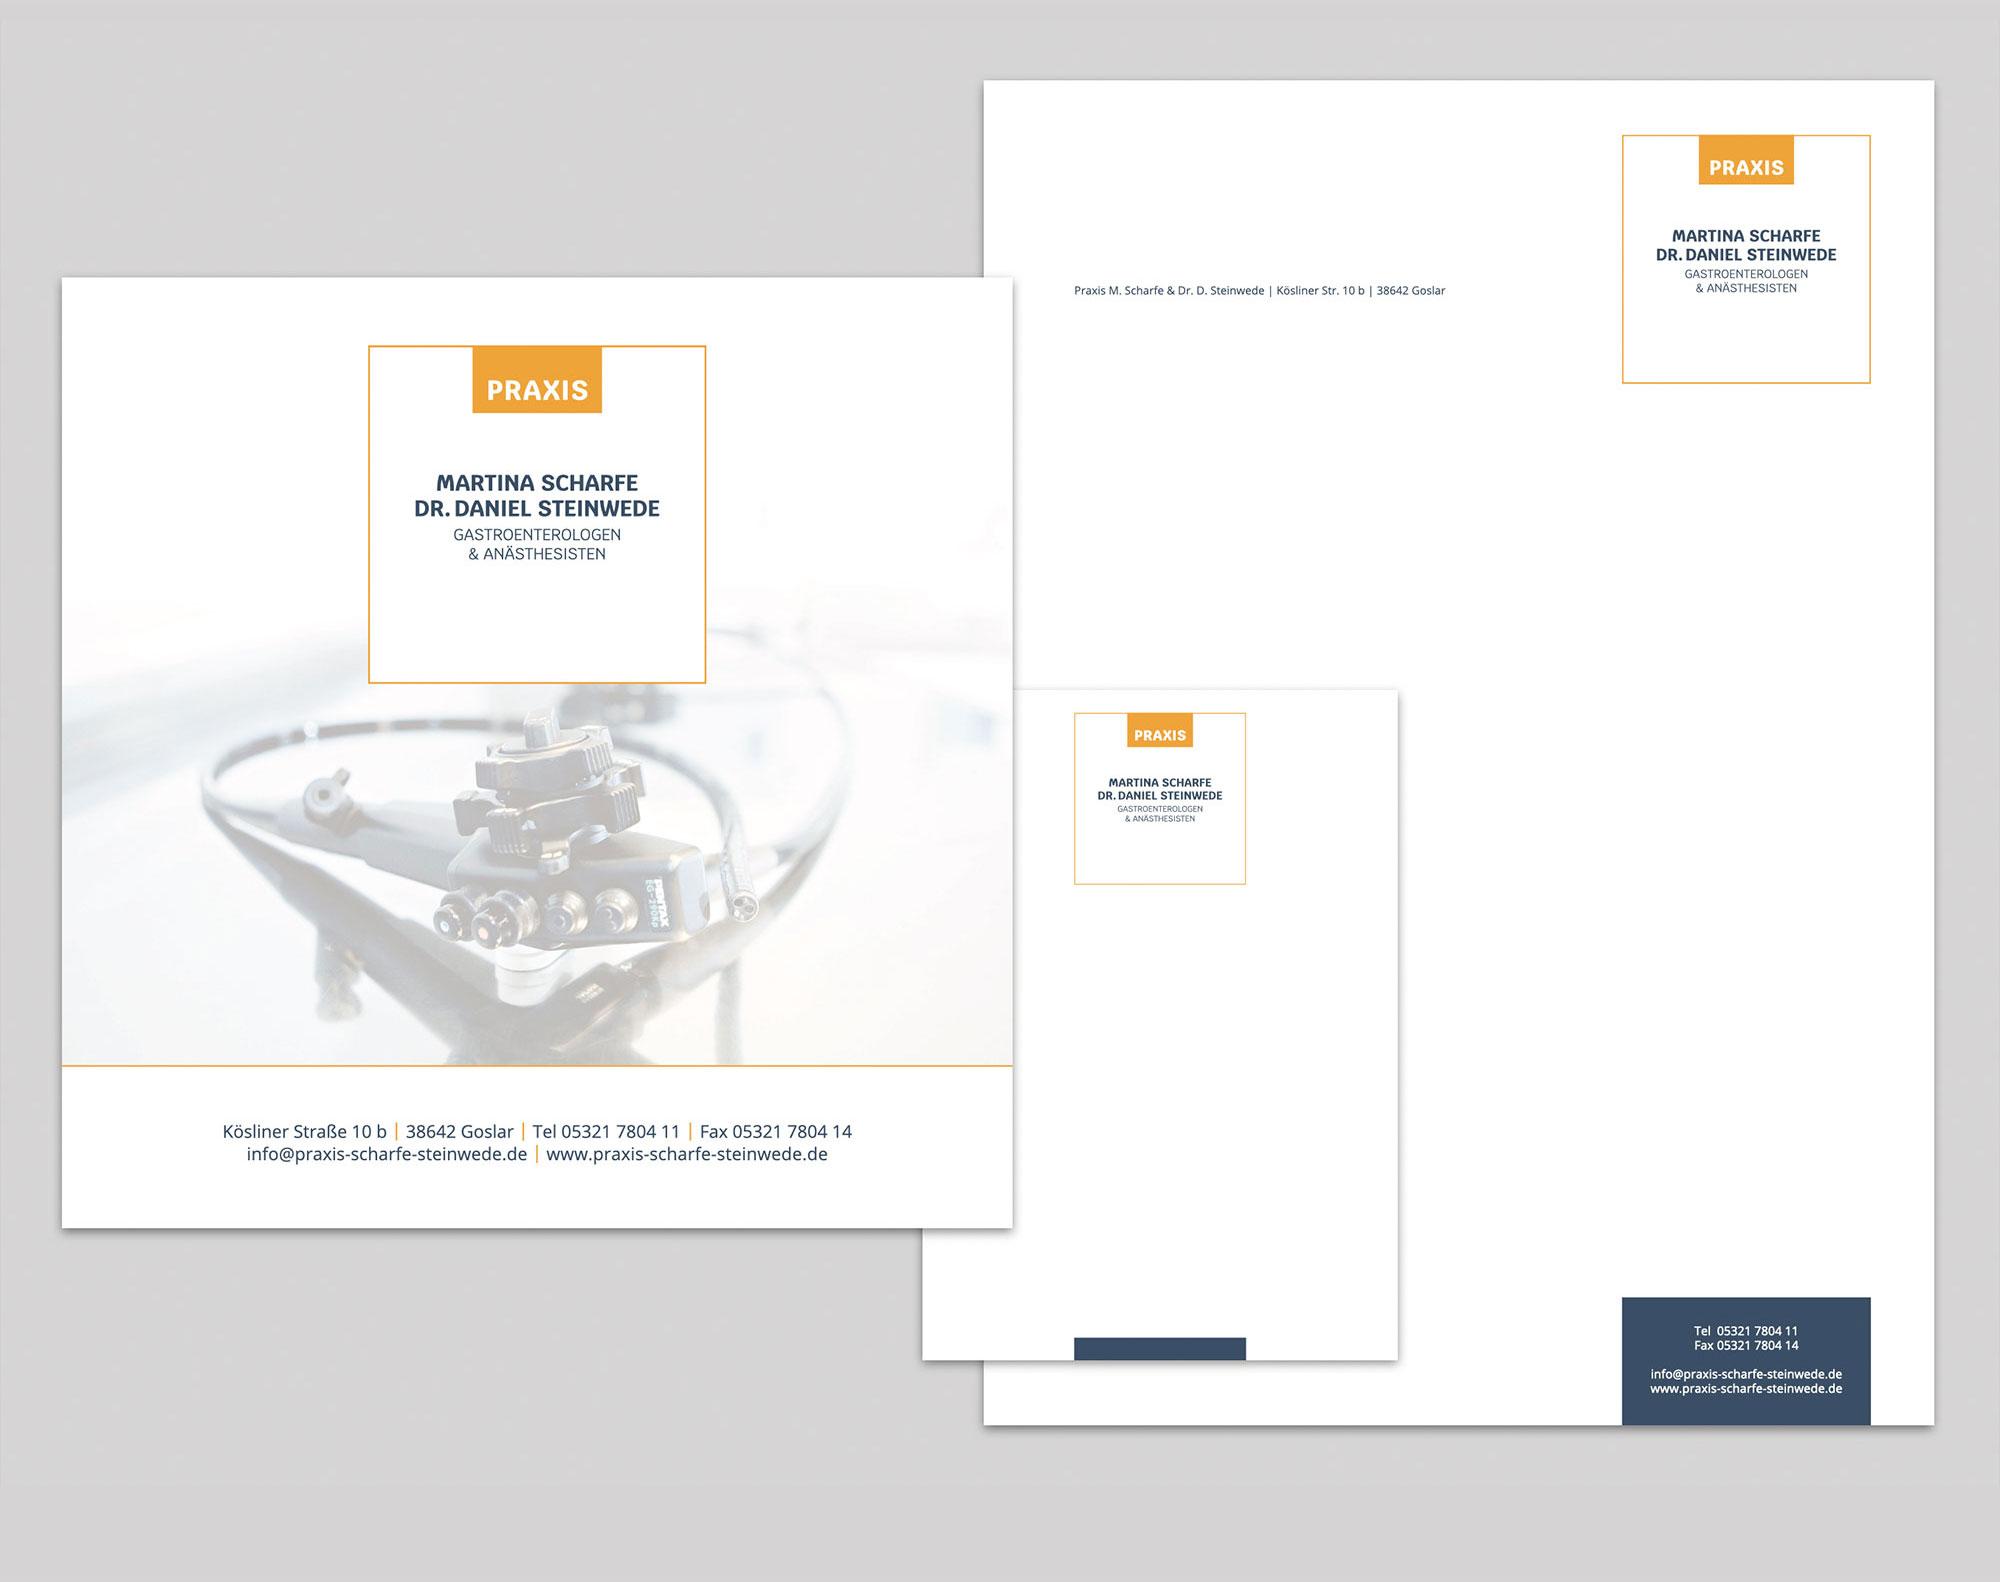 Corporate Design Praxis Martina Scharfe Dr. Daniel Steinwede Gastroenterologen & Anästhesisten